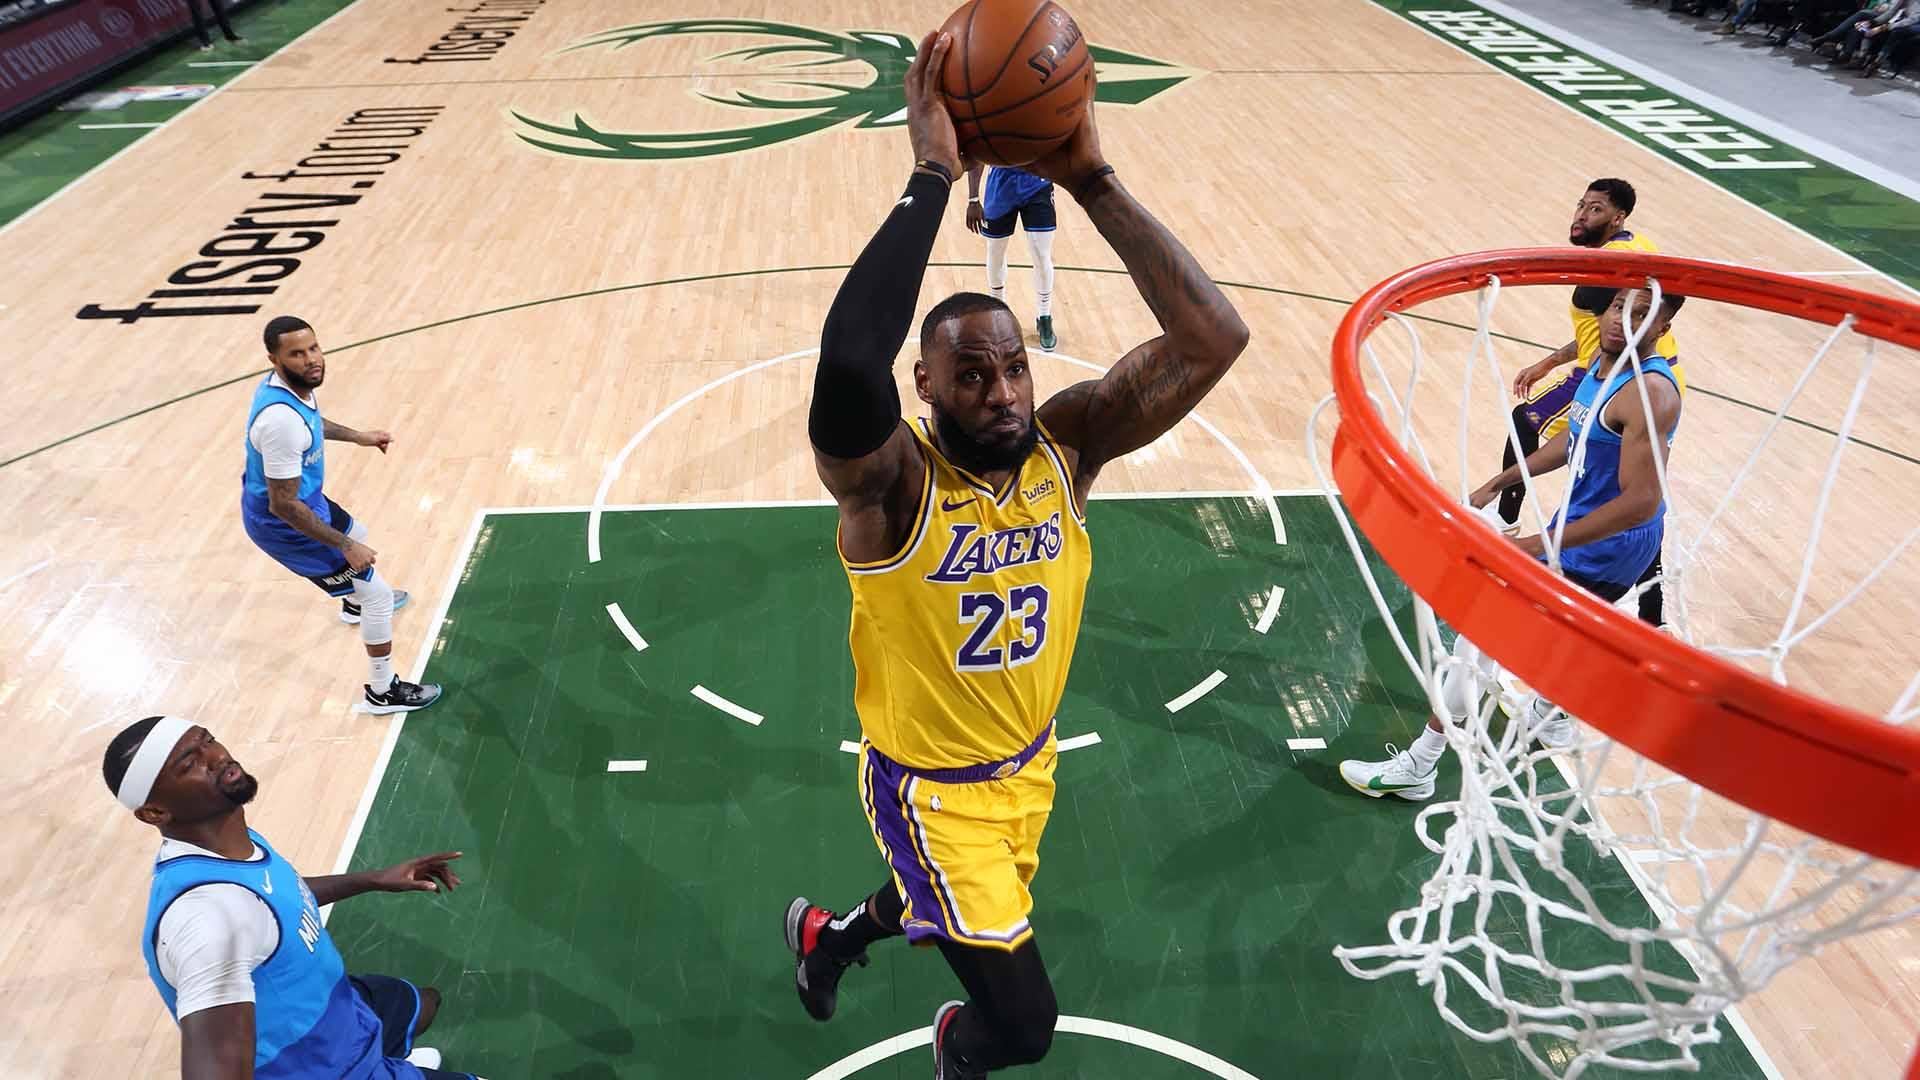 Top Plays From Lakers' 10-Game Road Win Streak